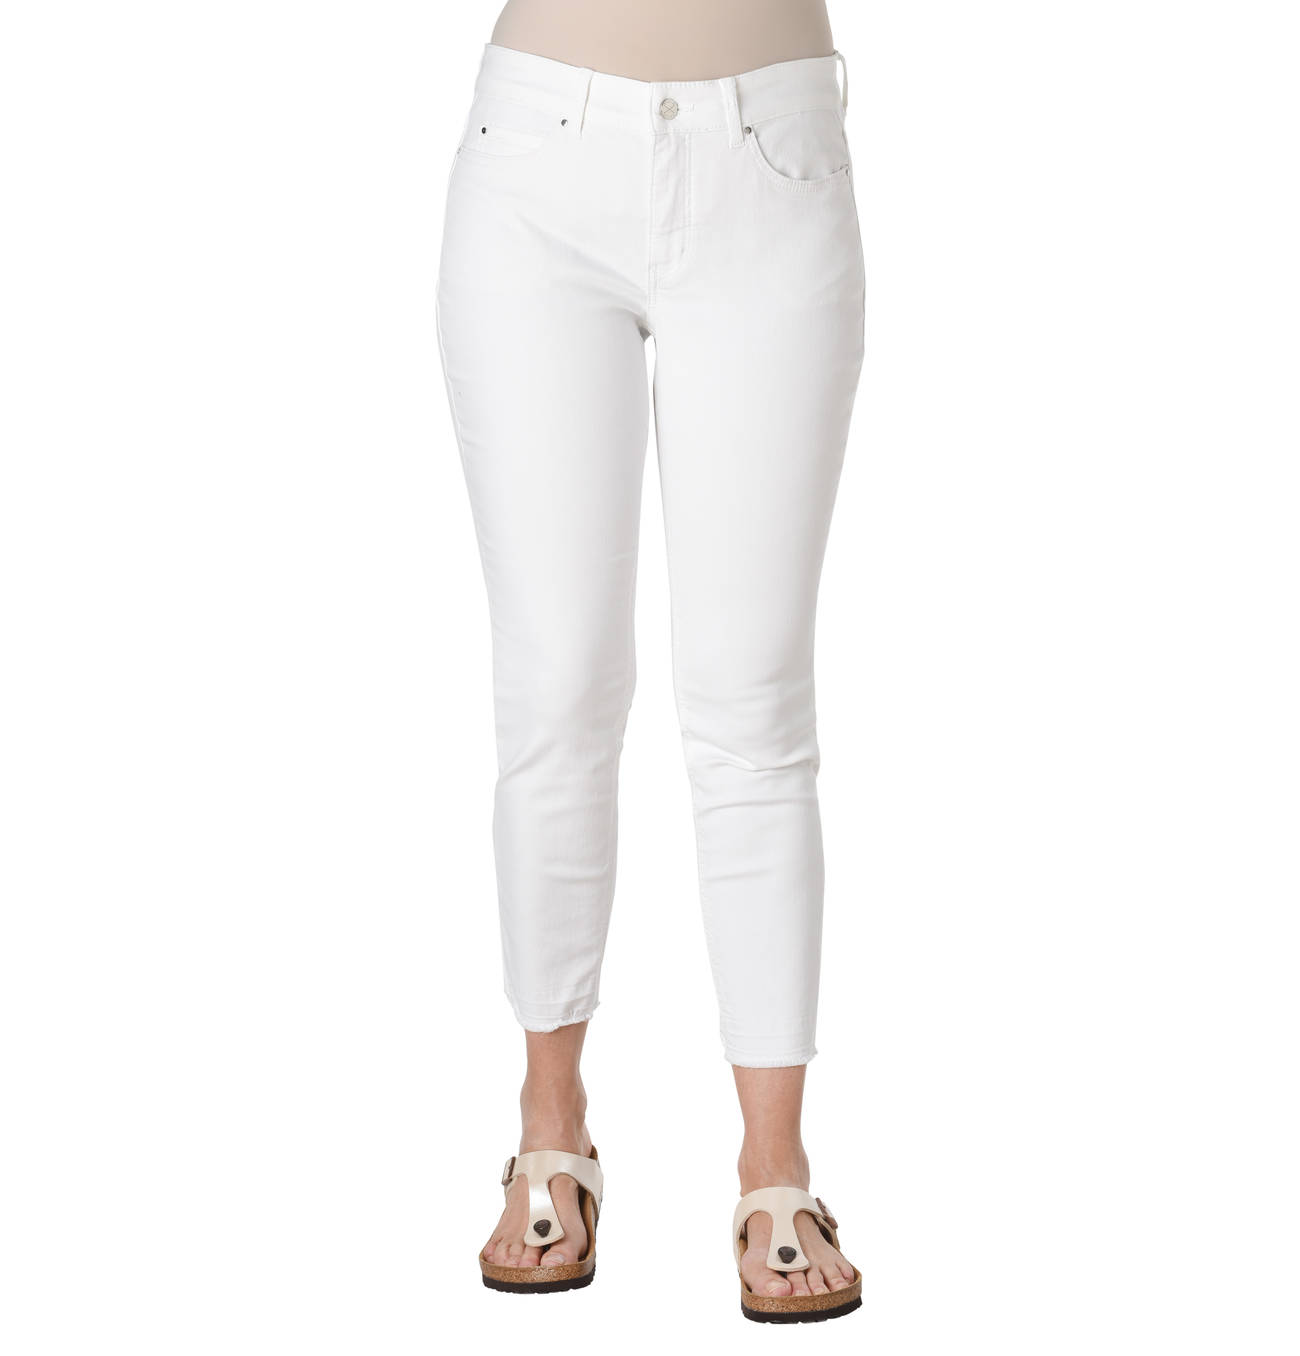 Damen Jona Extra Skinny Jeans, , unifarben, Gr.3232